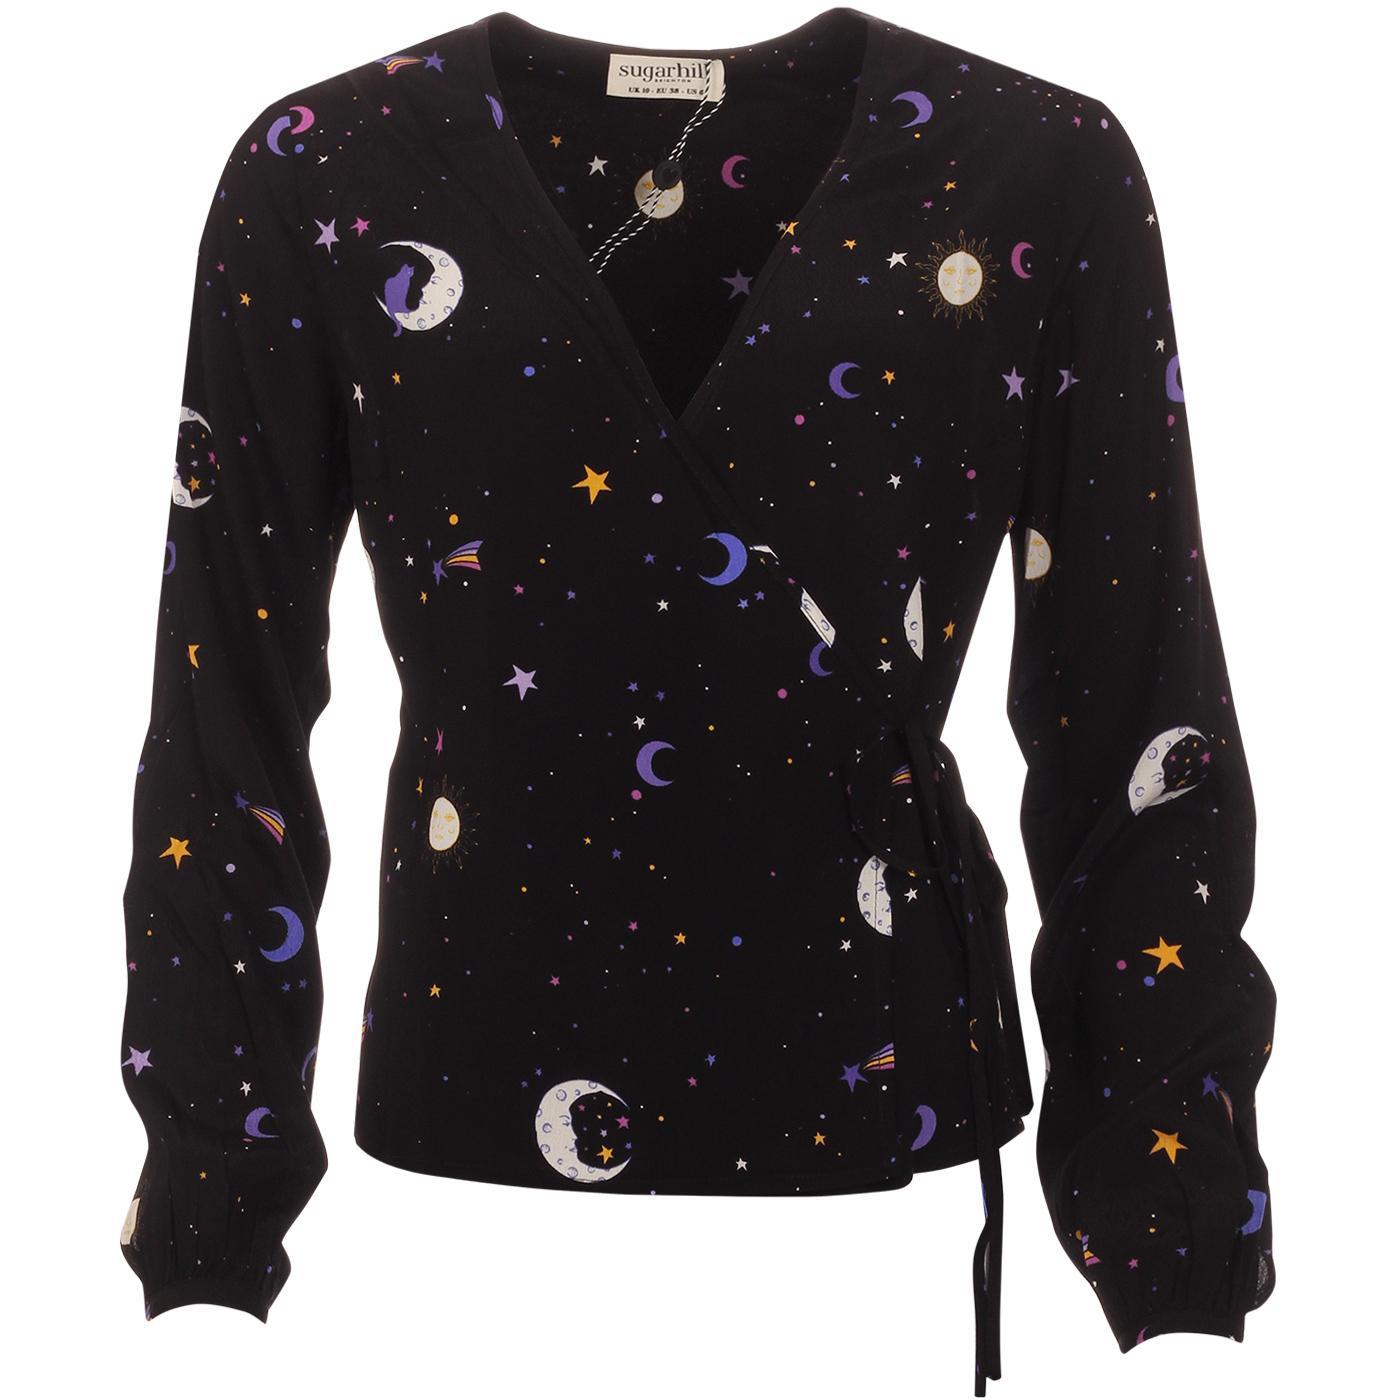 Giselle SUGARHILL BRIGHTON Astrological Nights Top